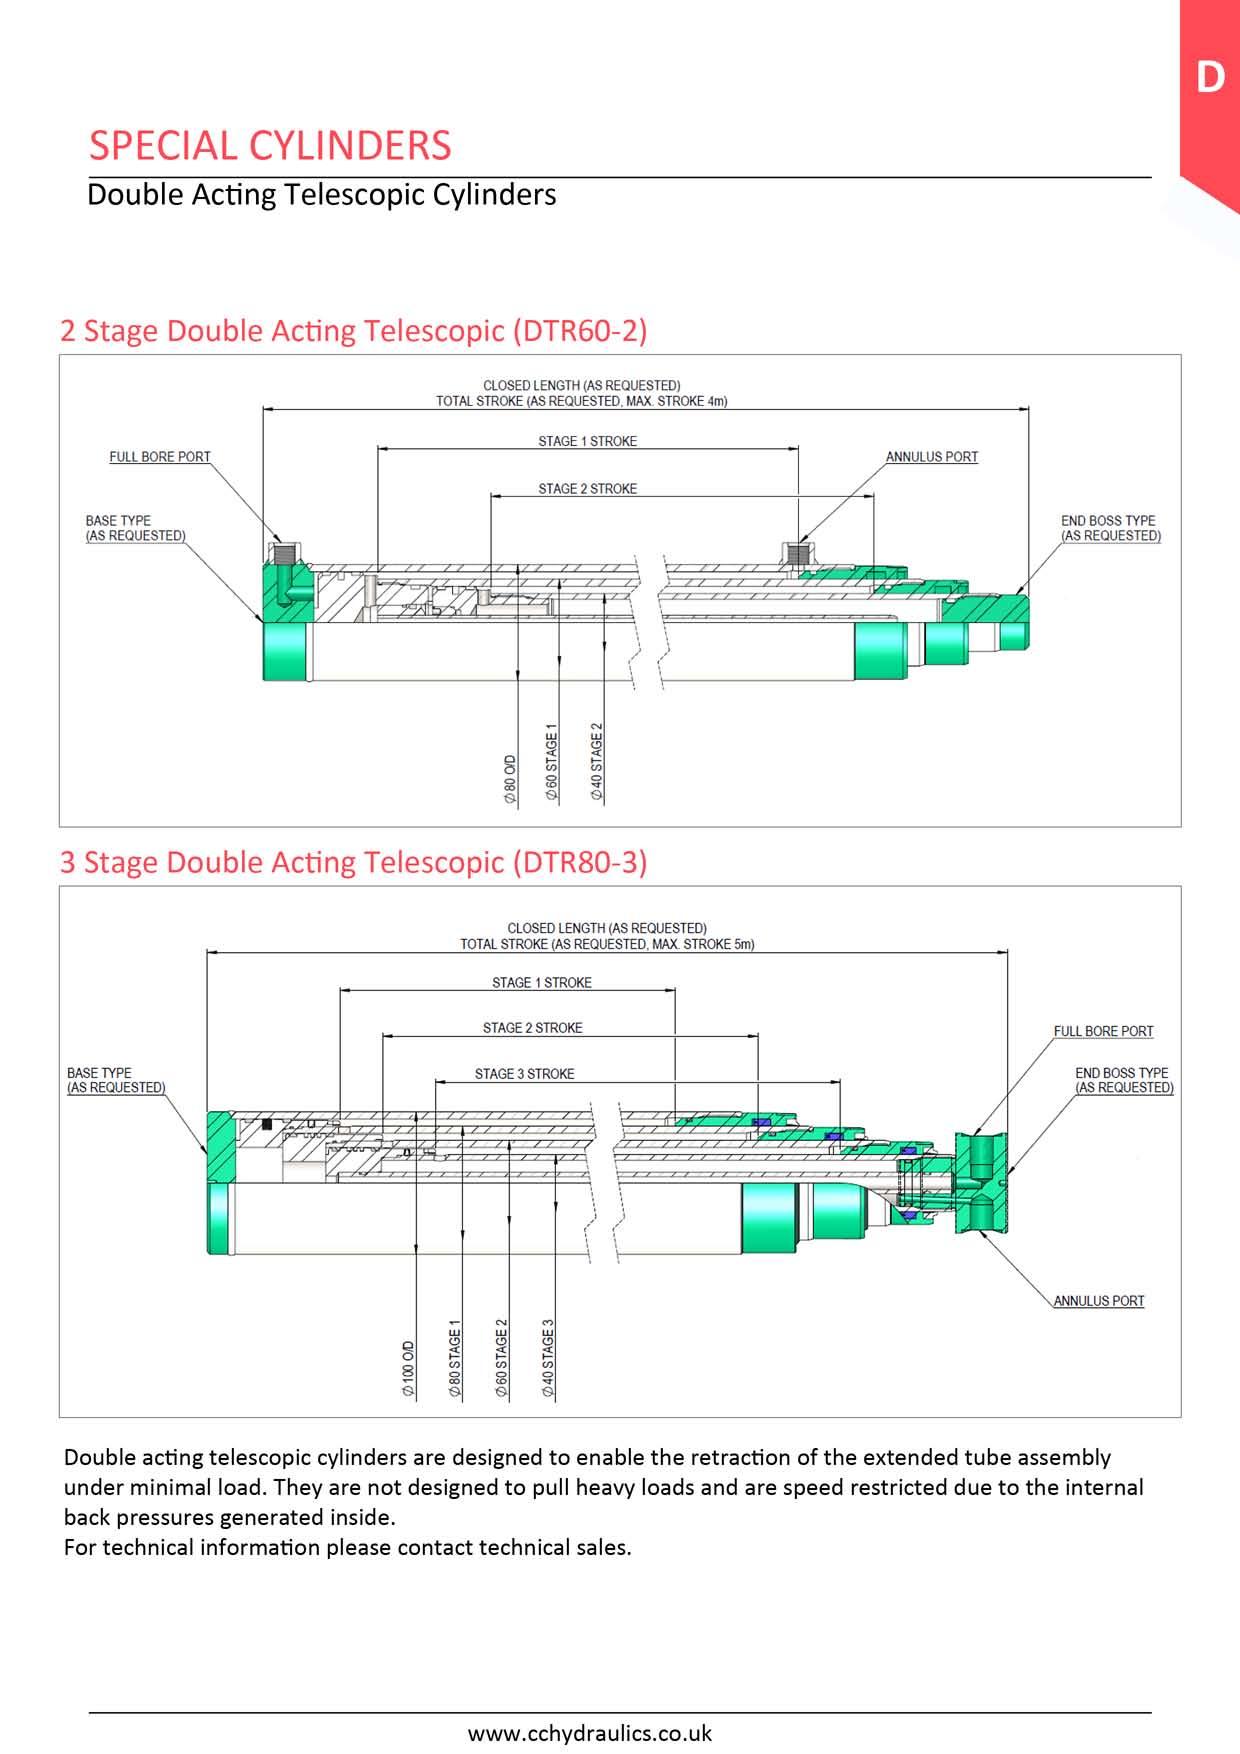 5 Double acting telescopic double acting telescopic c&c hydraulics ltd